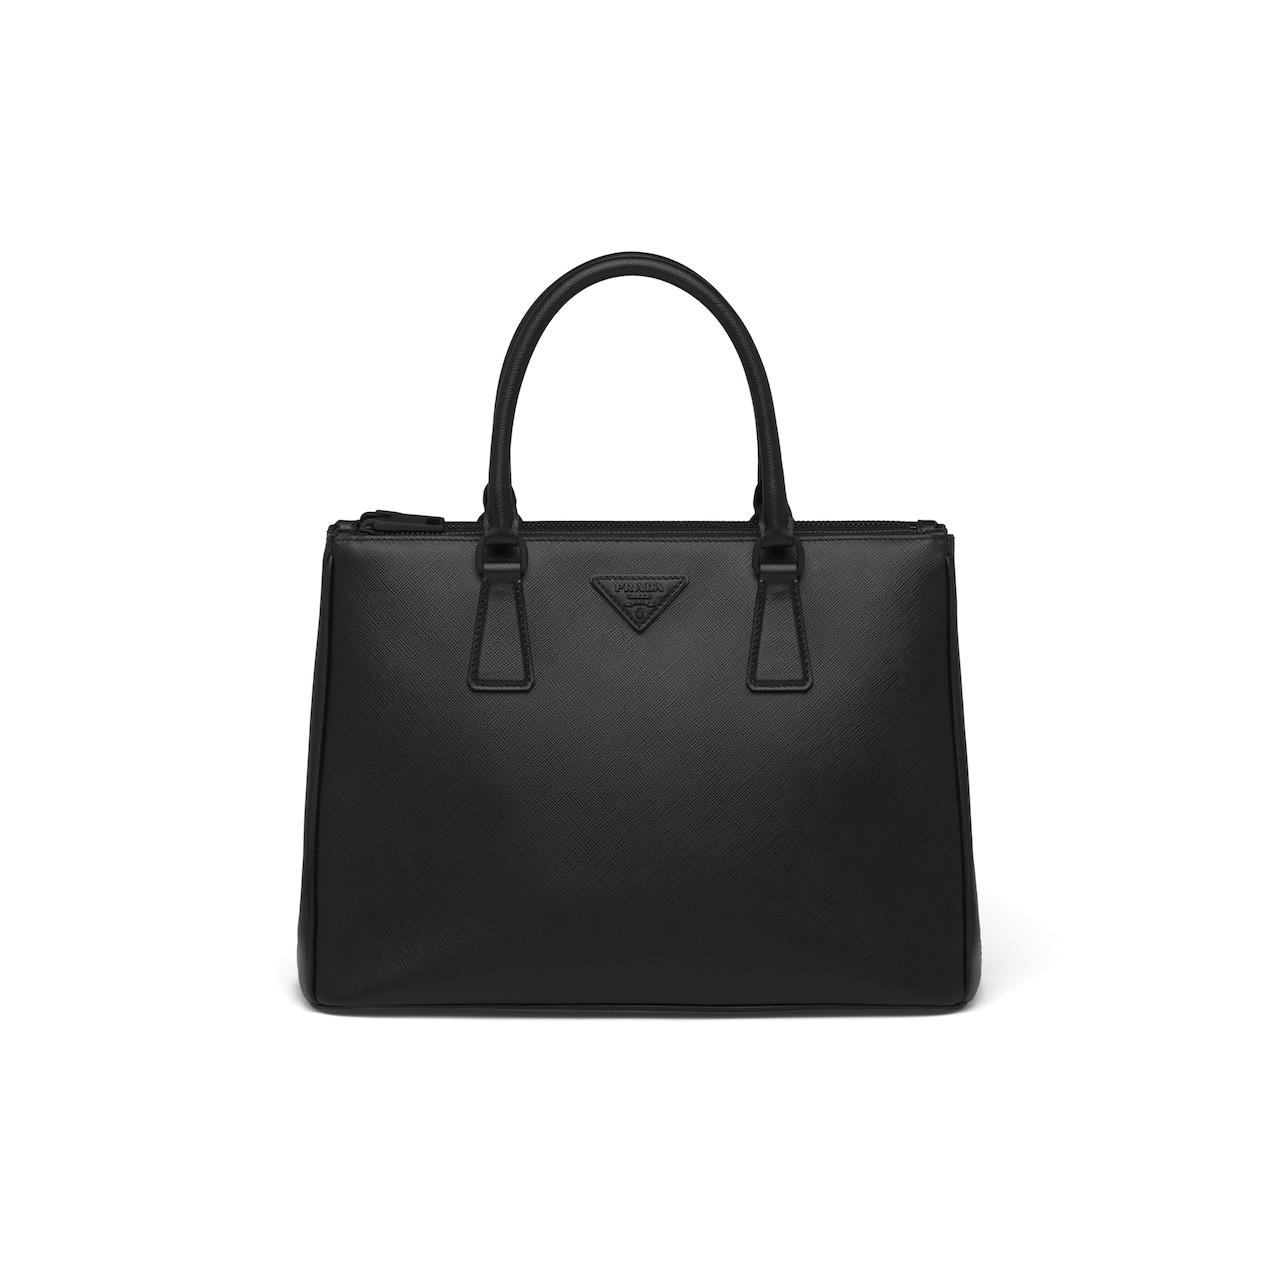 Prada Prada Galleria medium handbag 1